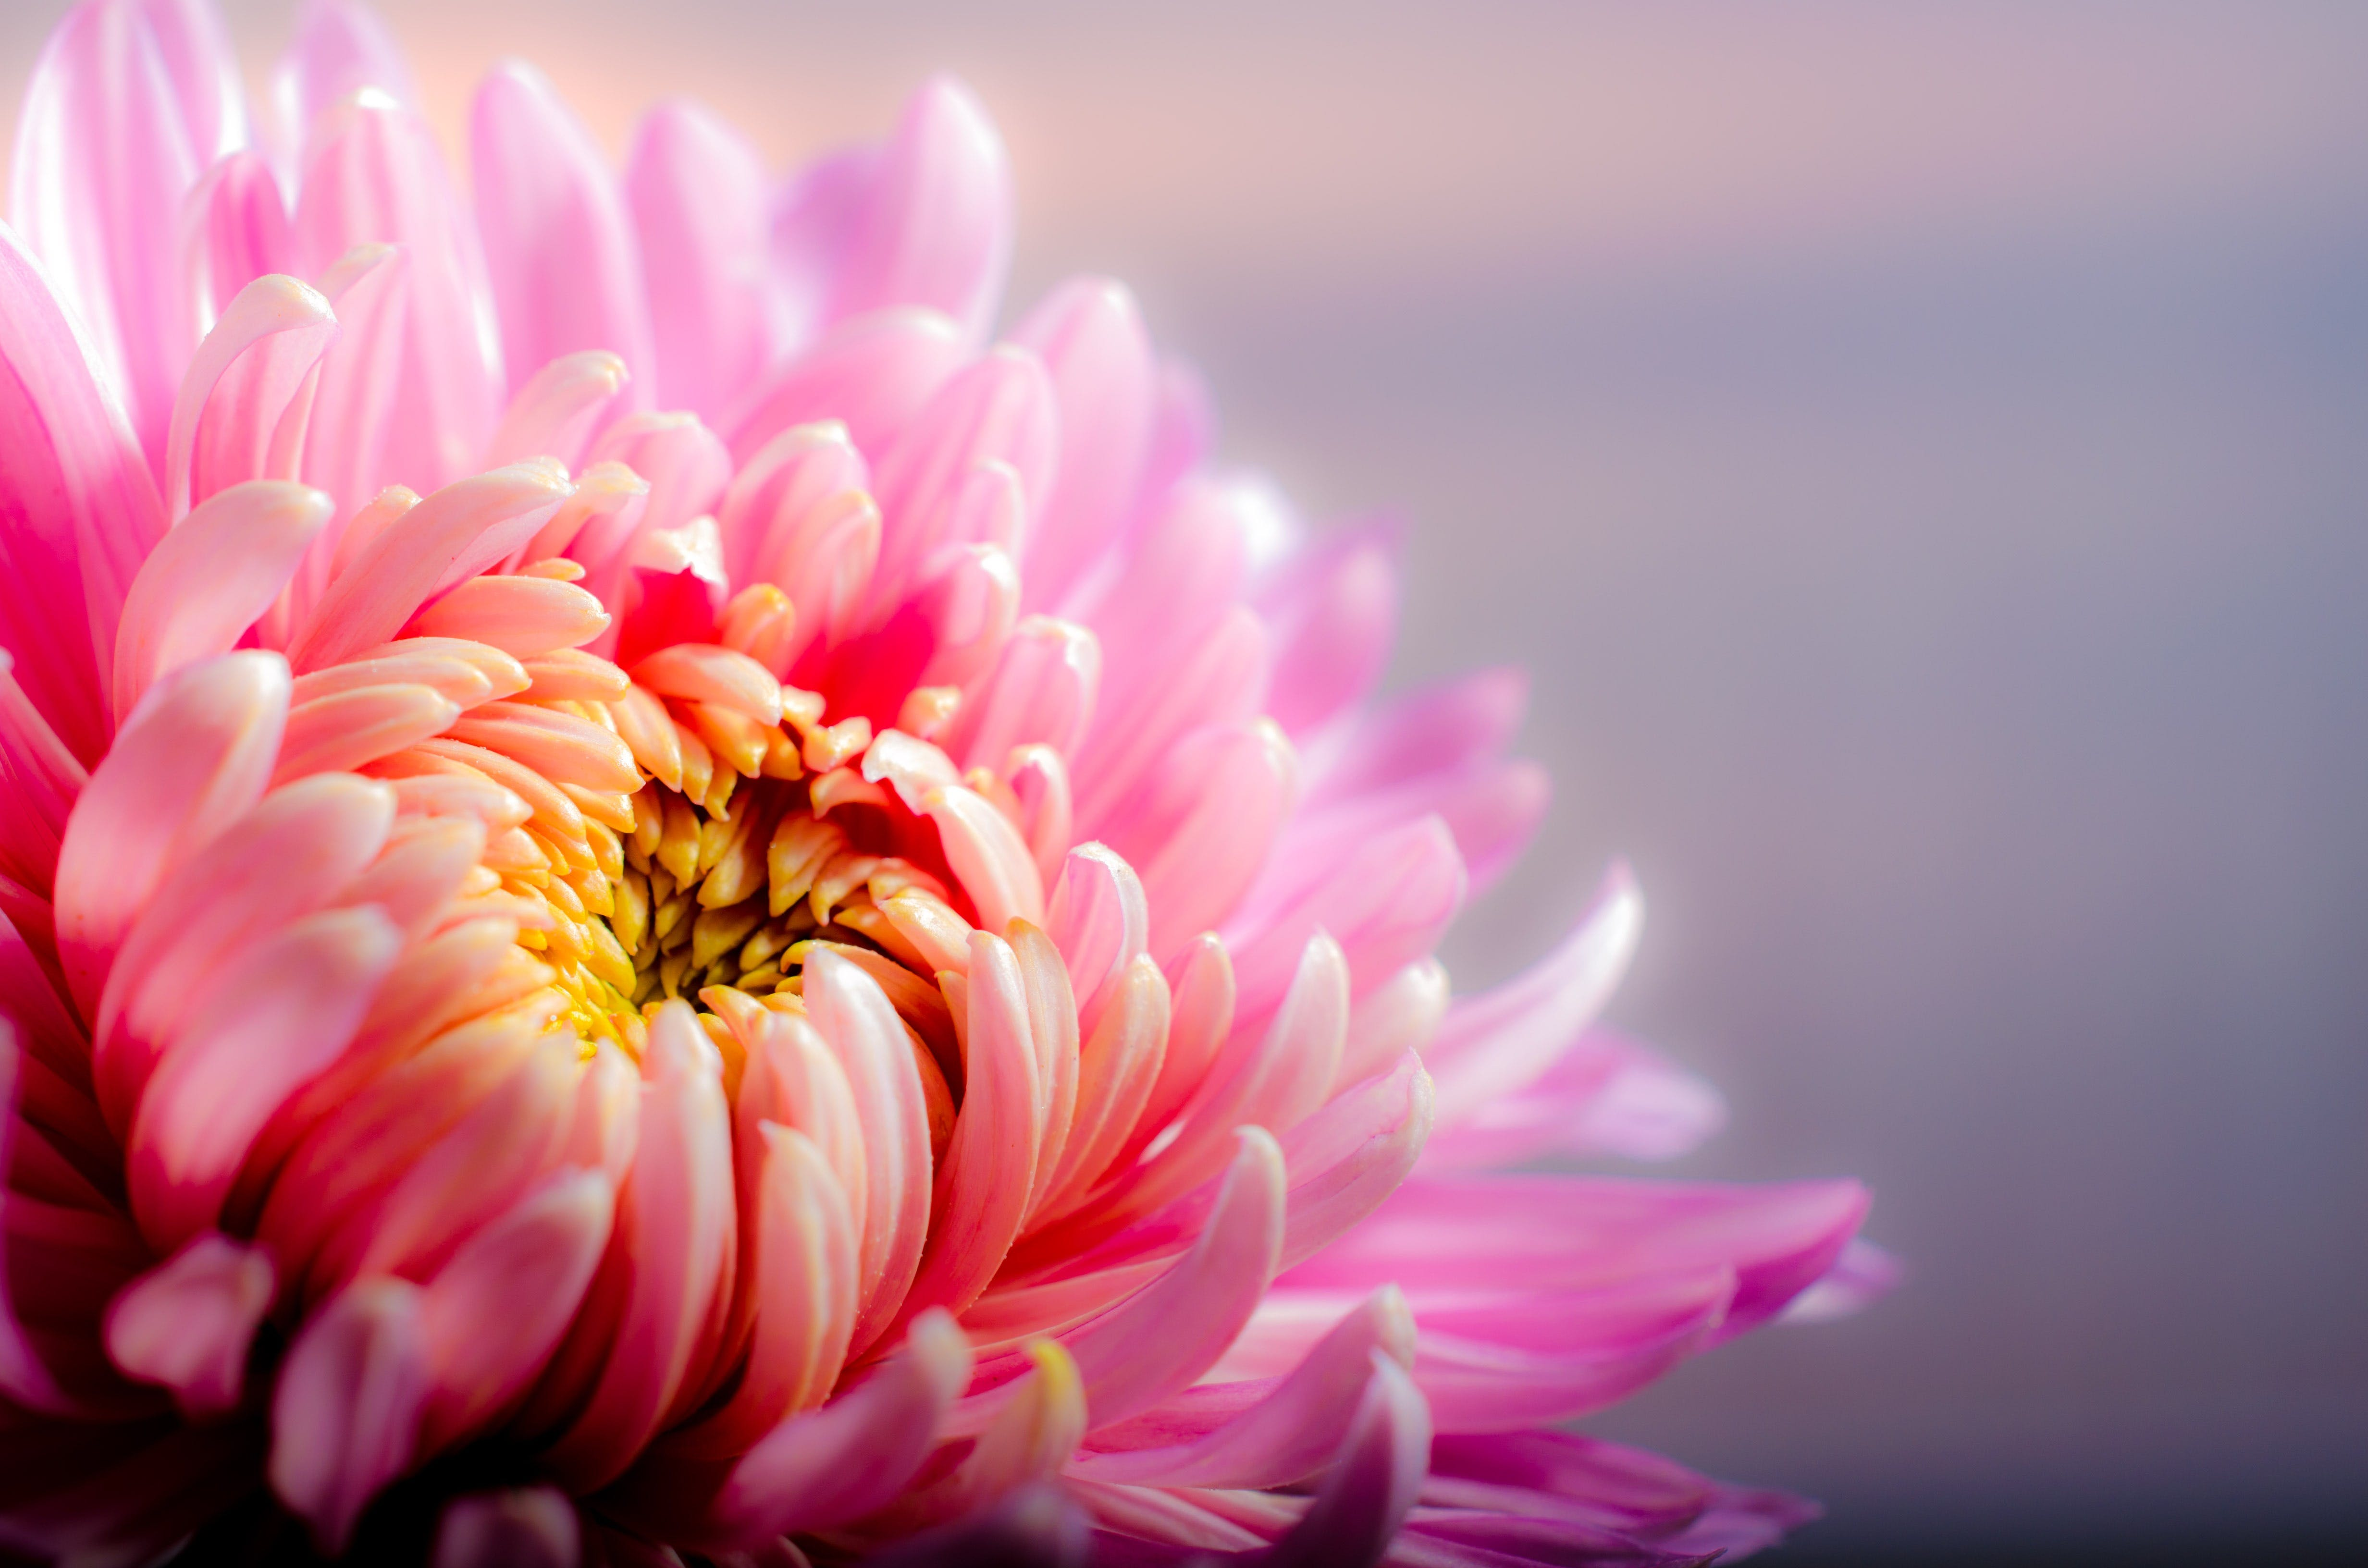 chrysanthemum, close-up, depth of field